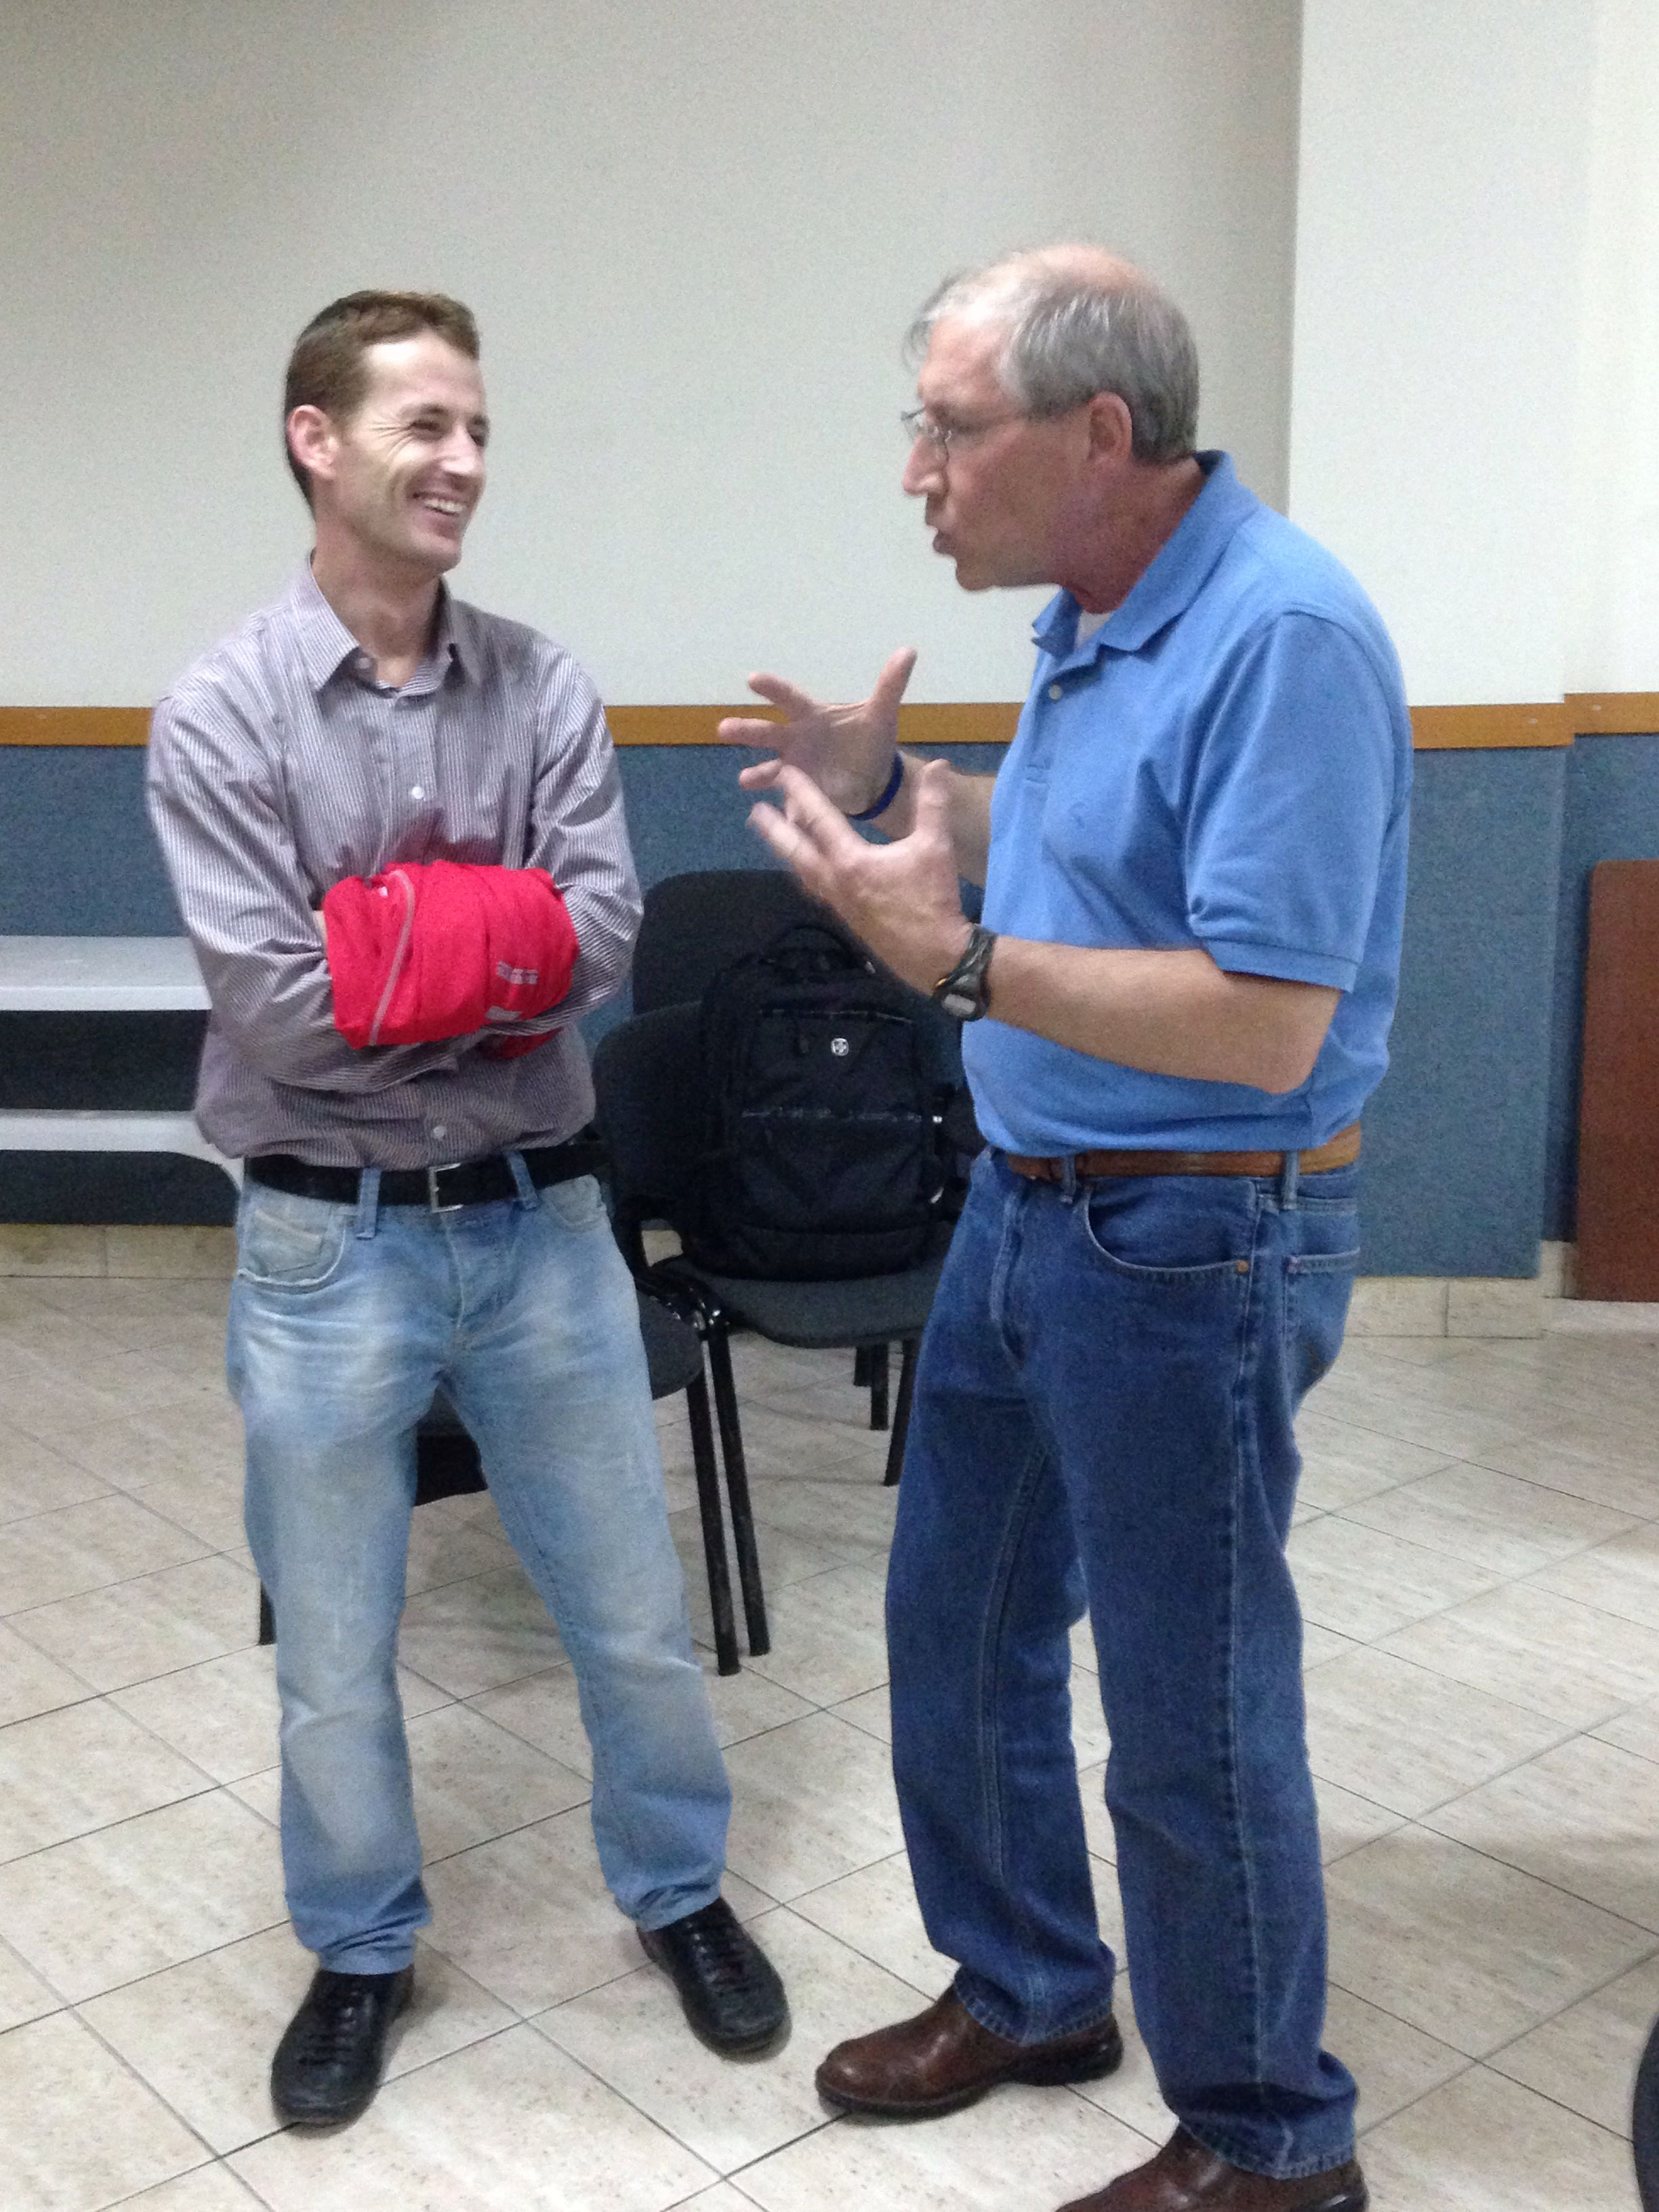 Gusti, the leader of Jete Studentore Tirana, talking to Jim